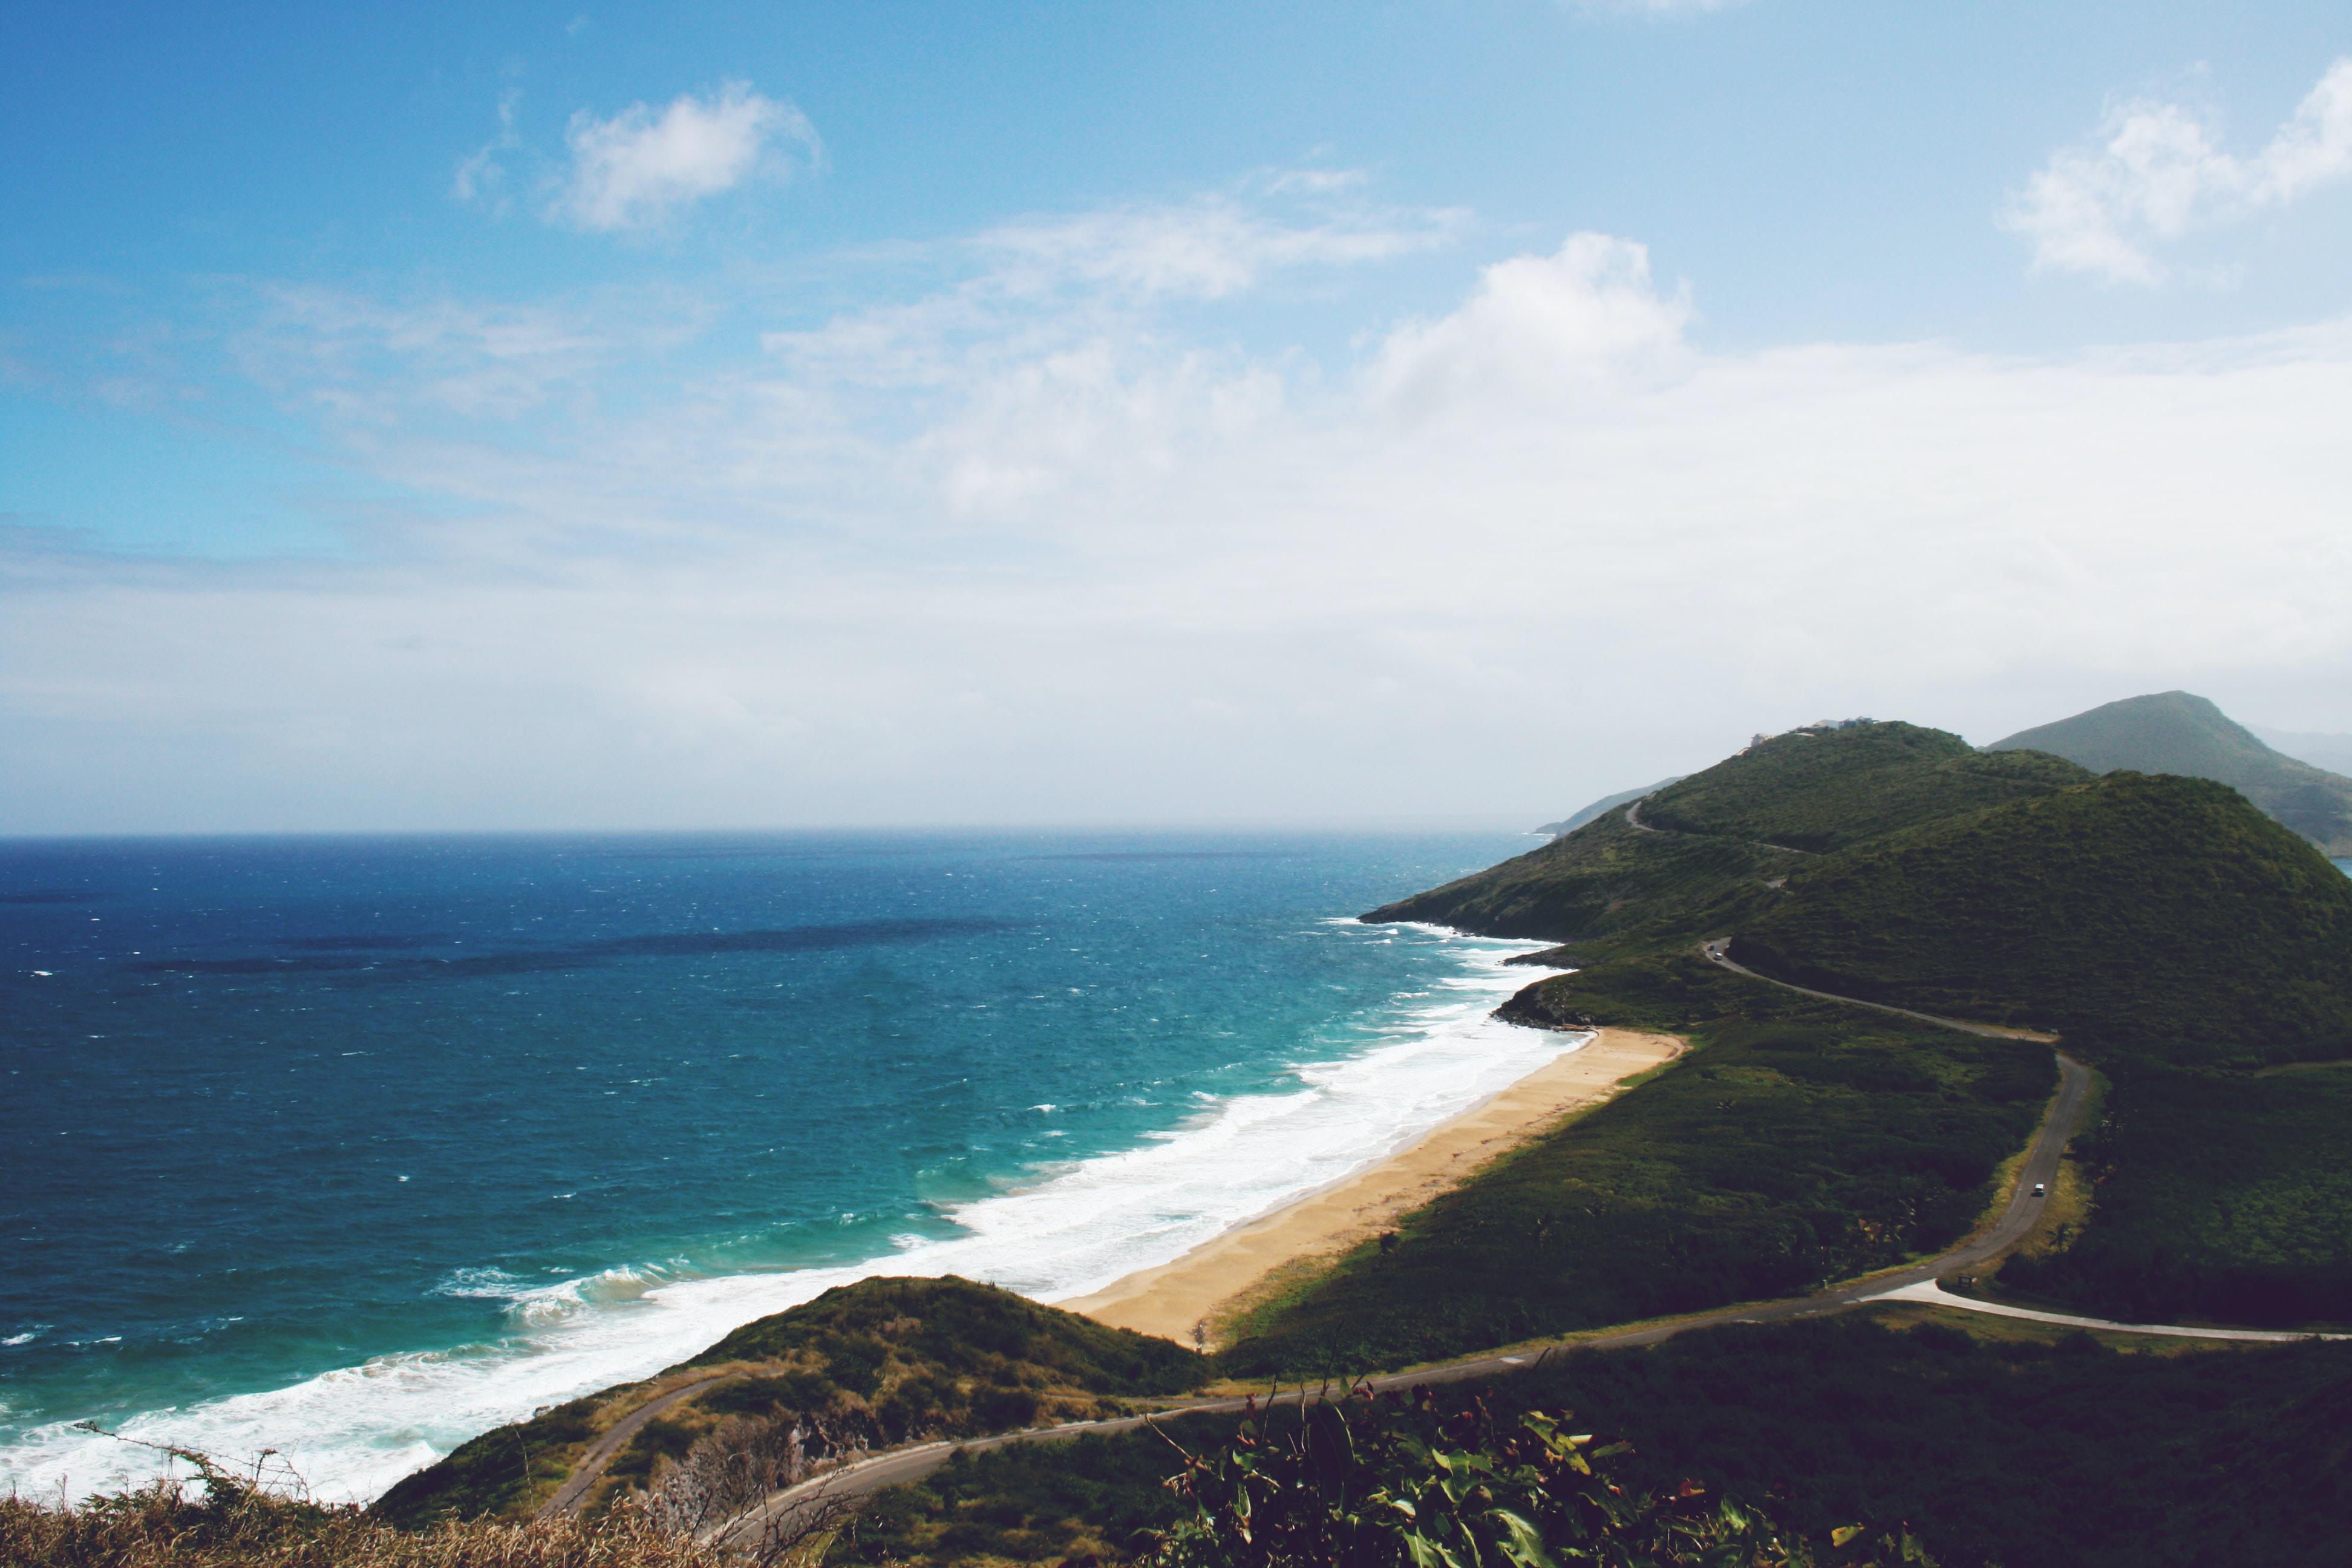 Driving along paradise, a beautiful shoreline near the sea area.